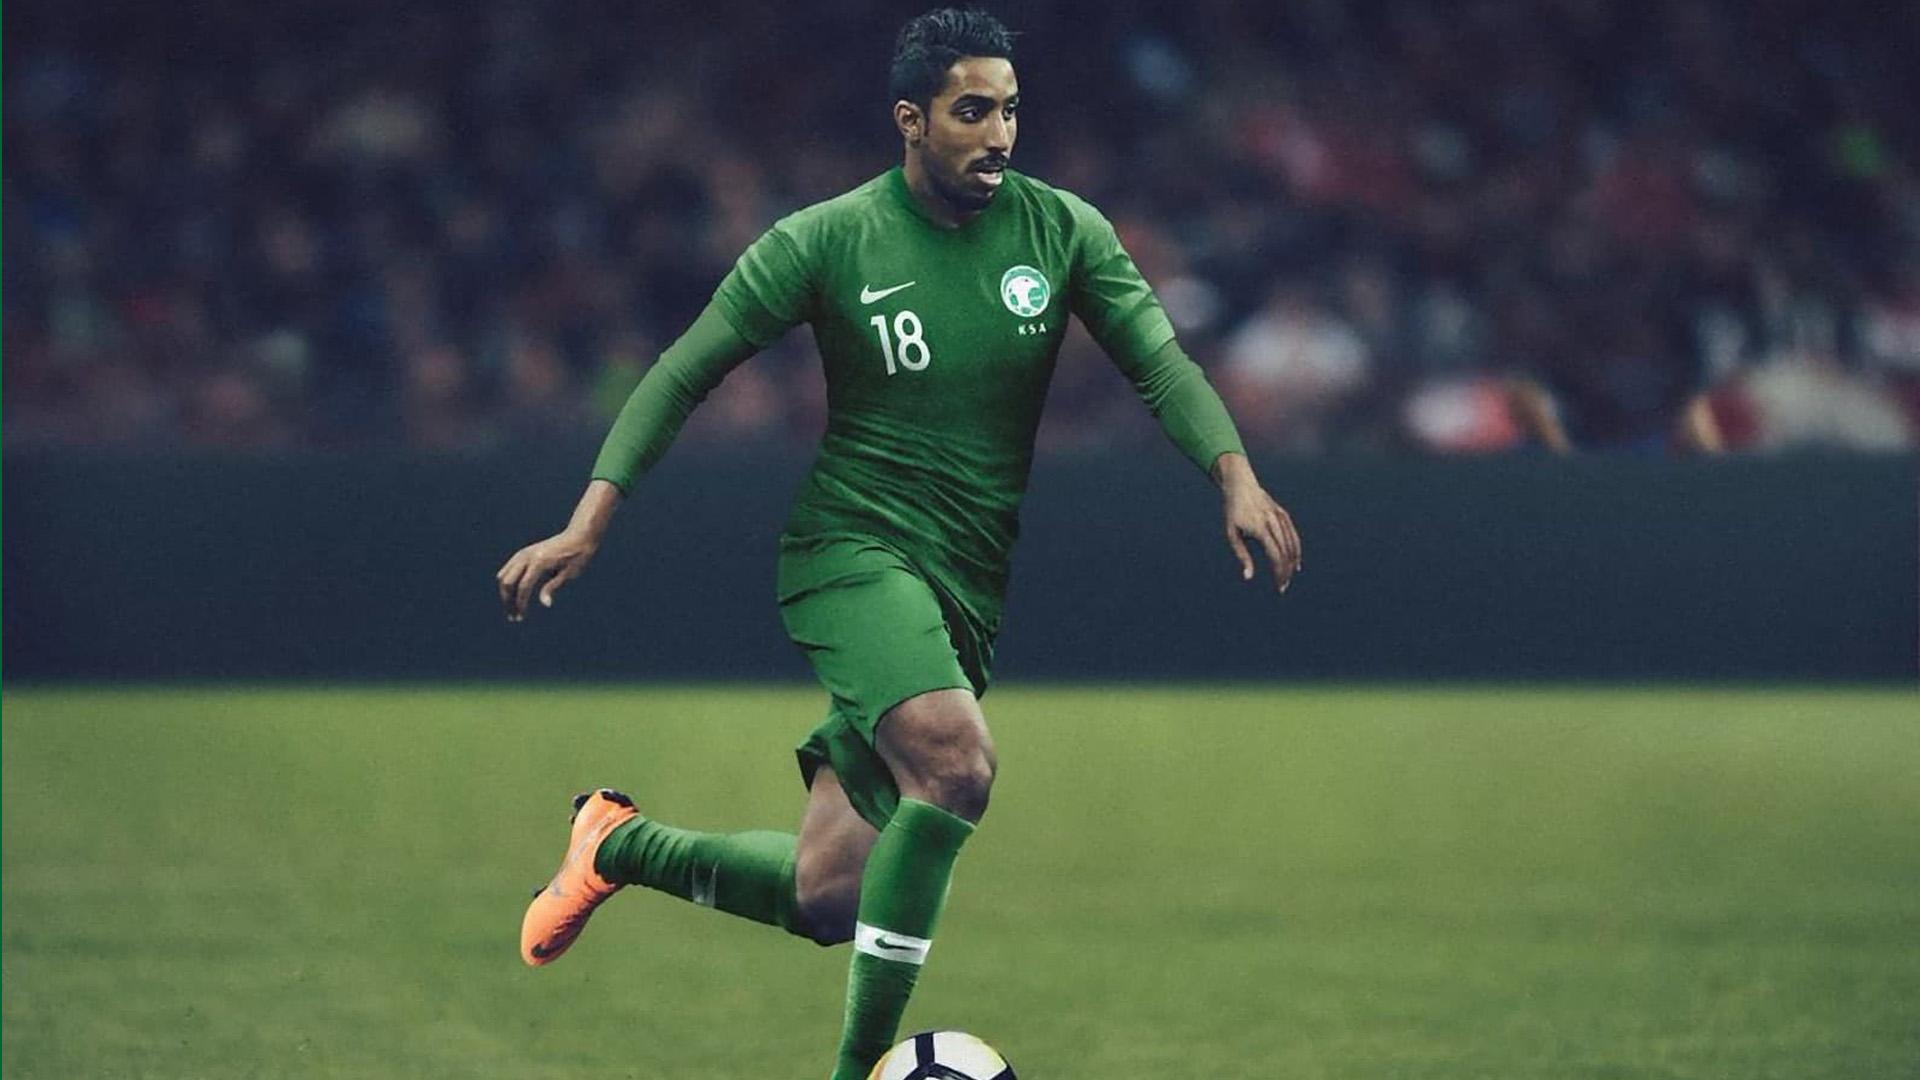 Arabia Saudita Camiseta Alternativa Saudi Arabia Away Kit 2018